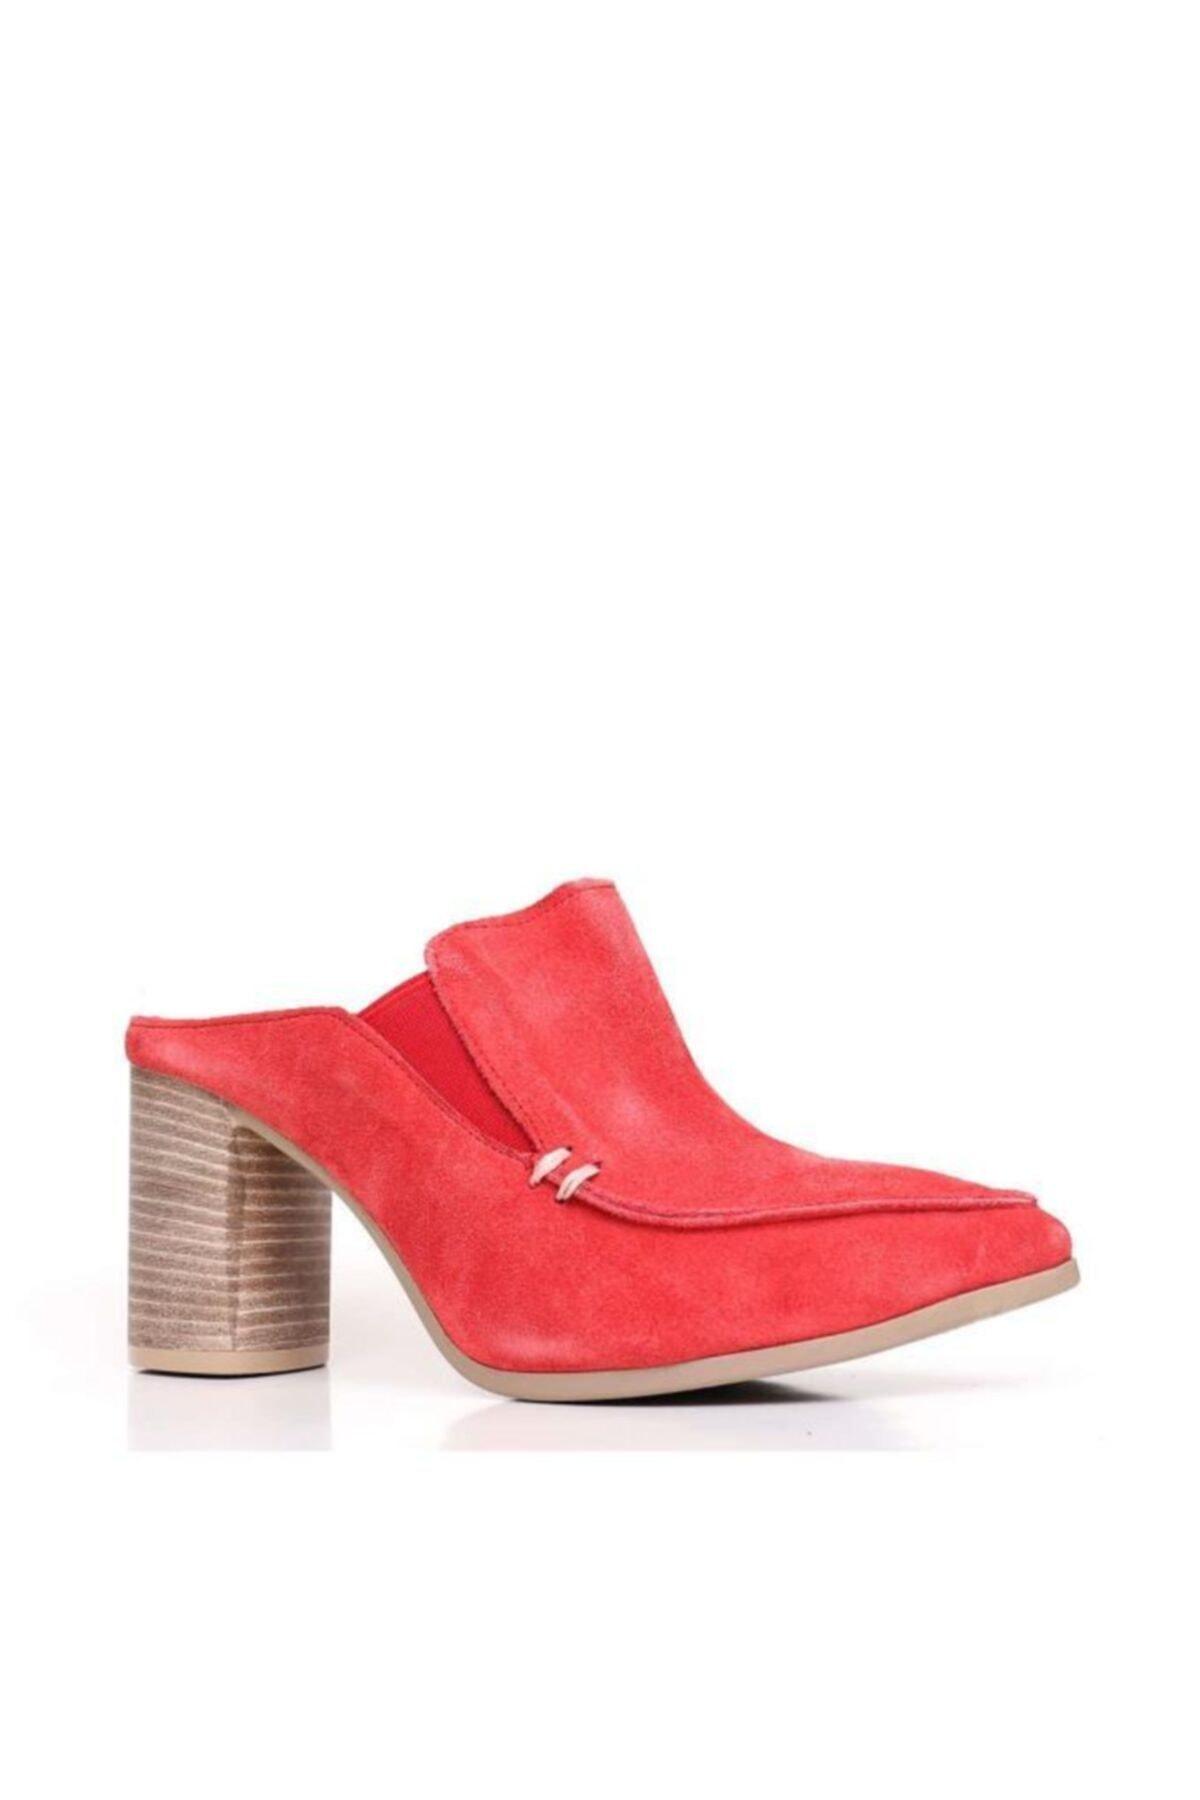 BUENO Shoes Lastik Detay Hakiki Deri Topuklu Kadın Terlik 9n6702 2